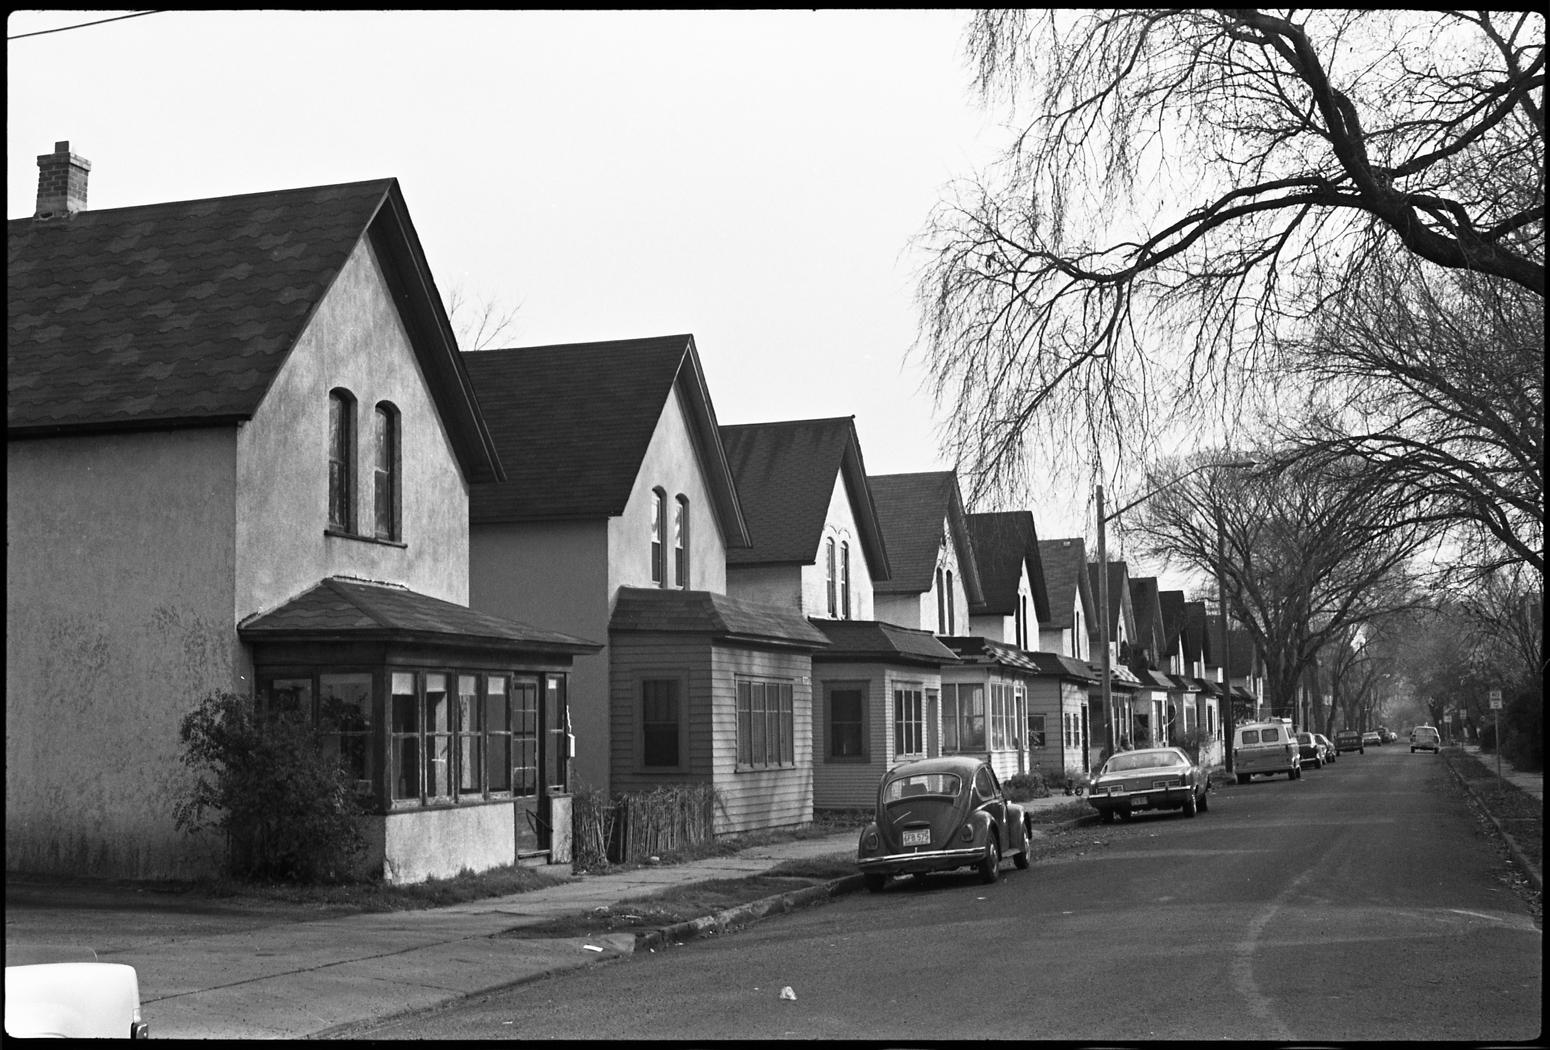 Milwaukee Avenue in 1974 (photo courtesy of Minnesota Historical Society)